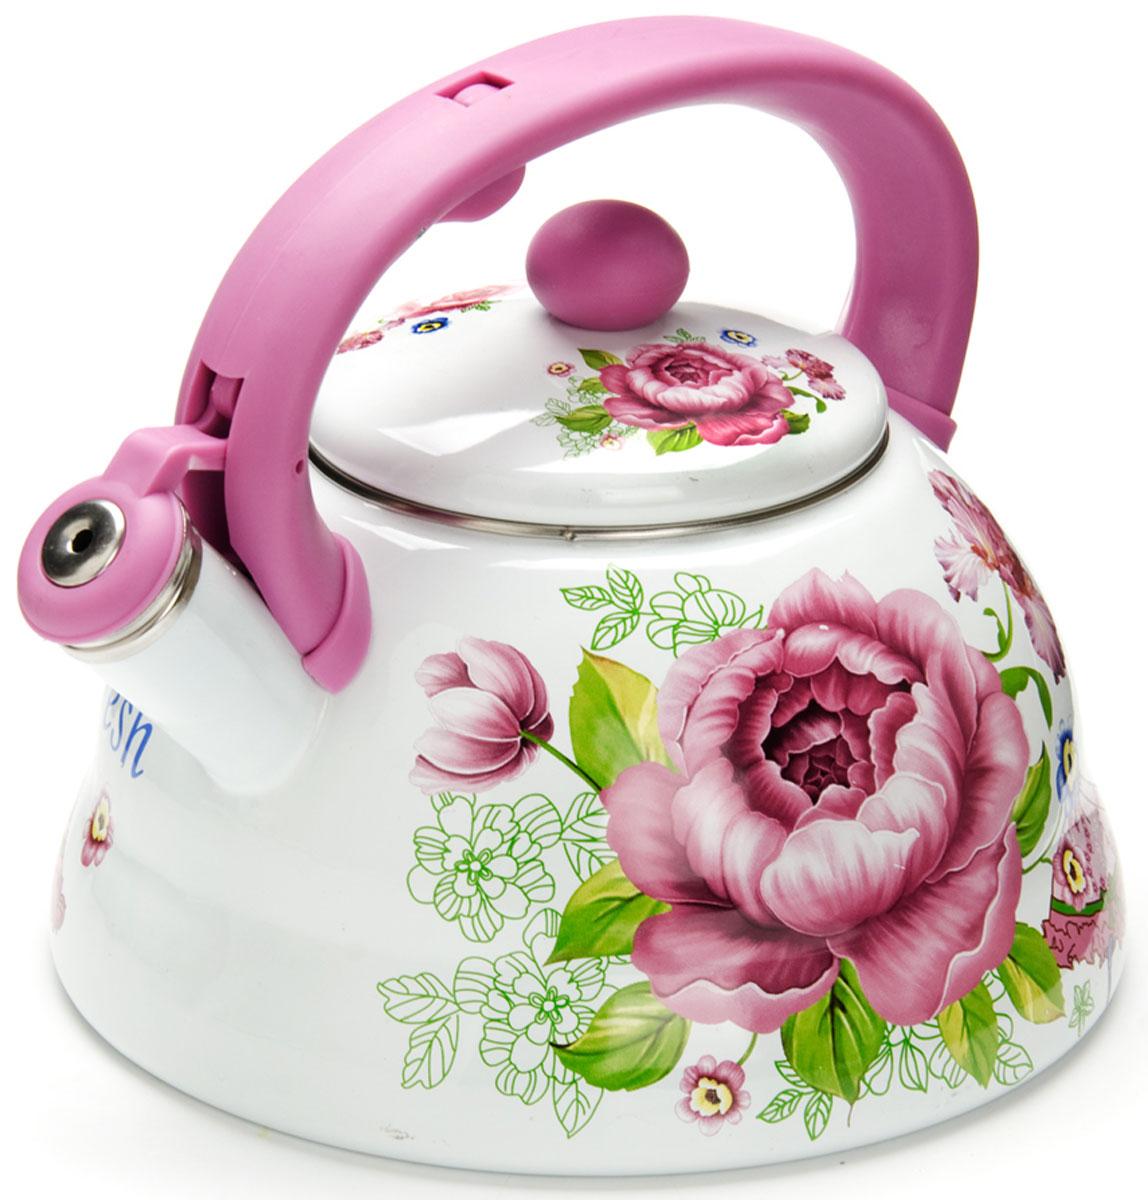 Чайник Mayer & Boch Розы, со свистком, 3 л. 2625726257